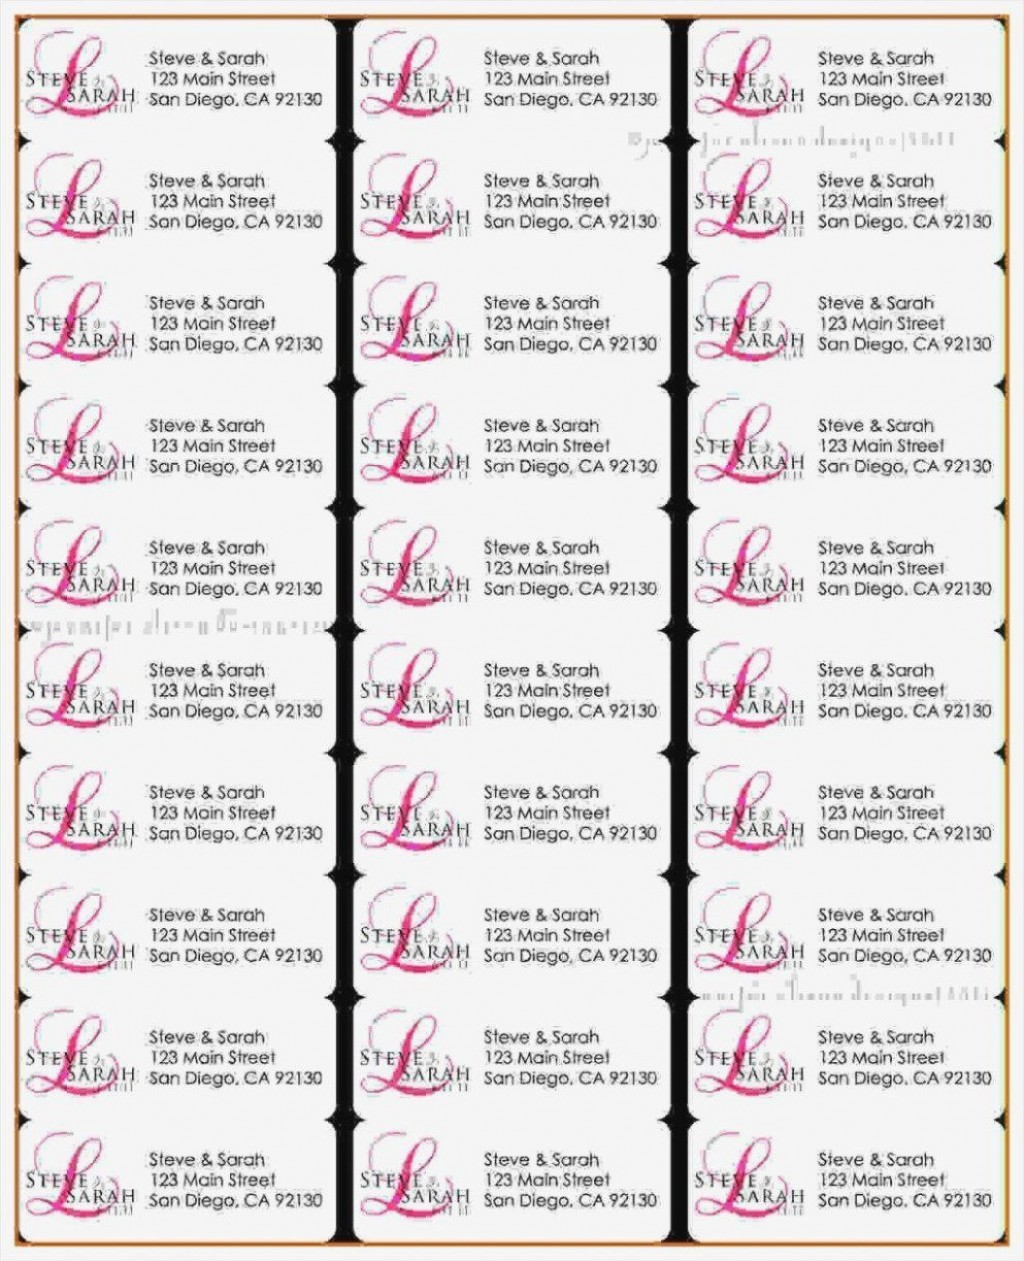 003 Wondrou Return Addres Label Template Sample  Google Doc Avery 80 Per Sheet Word FreeLarge